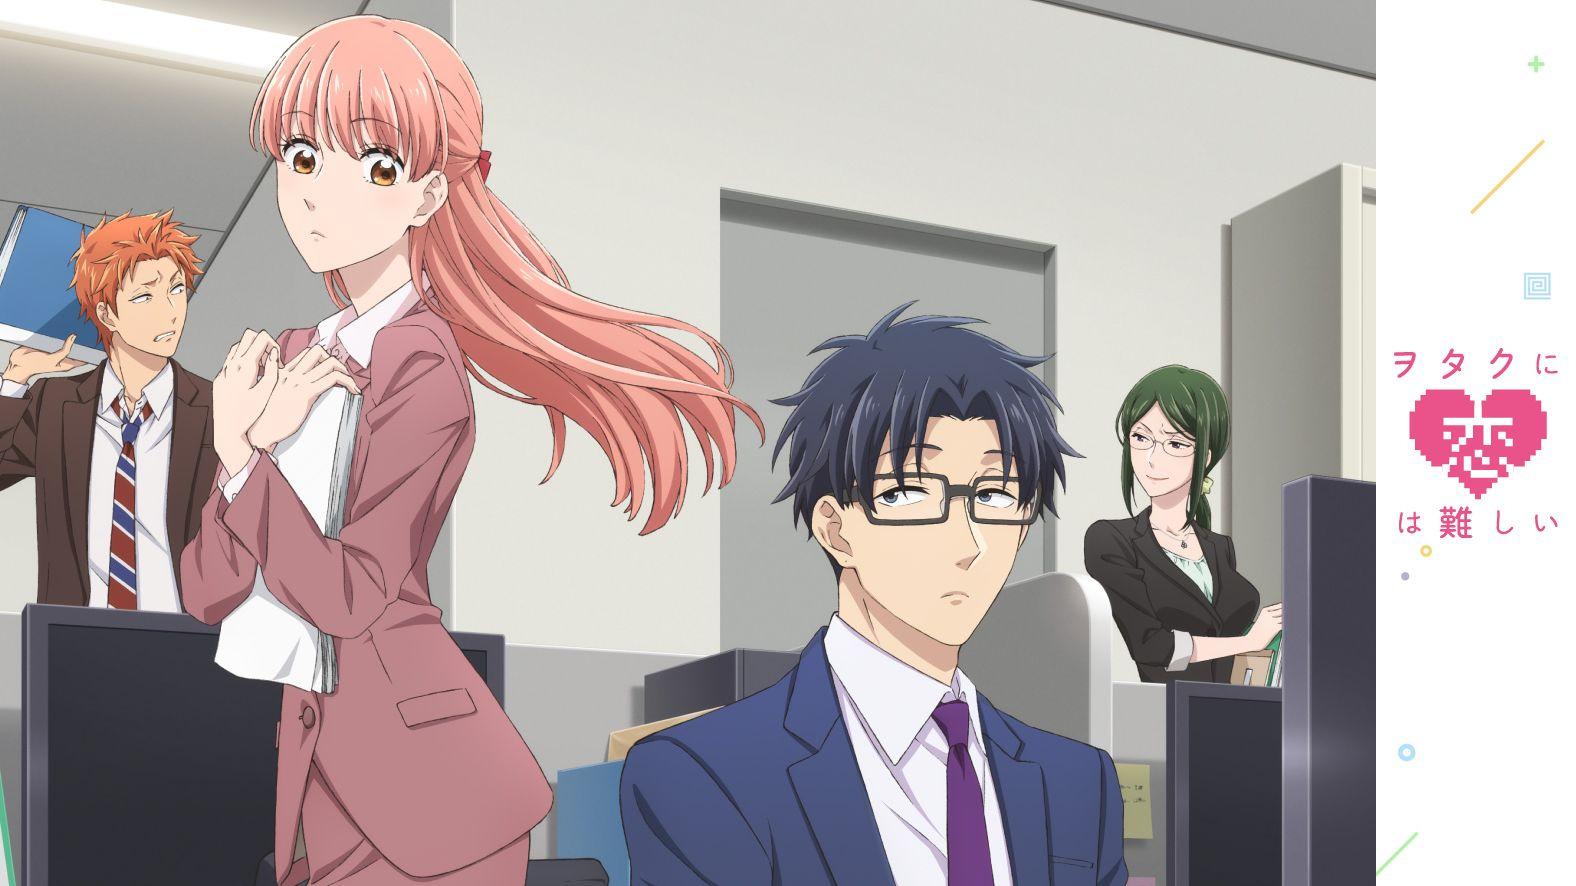 Anime Так сложно любить отаку